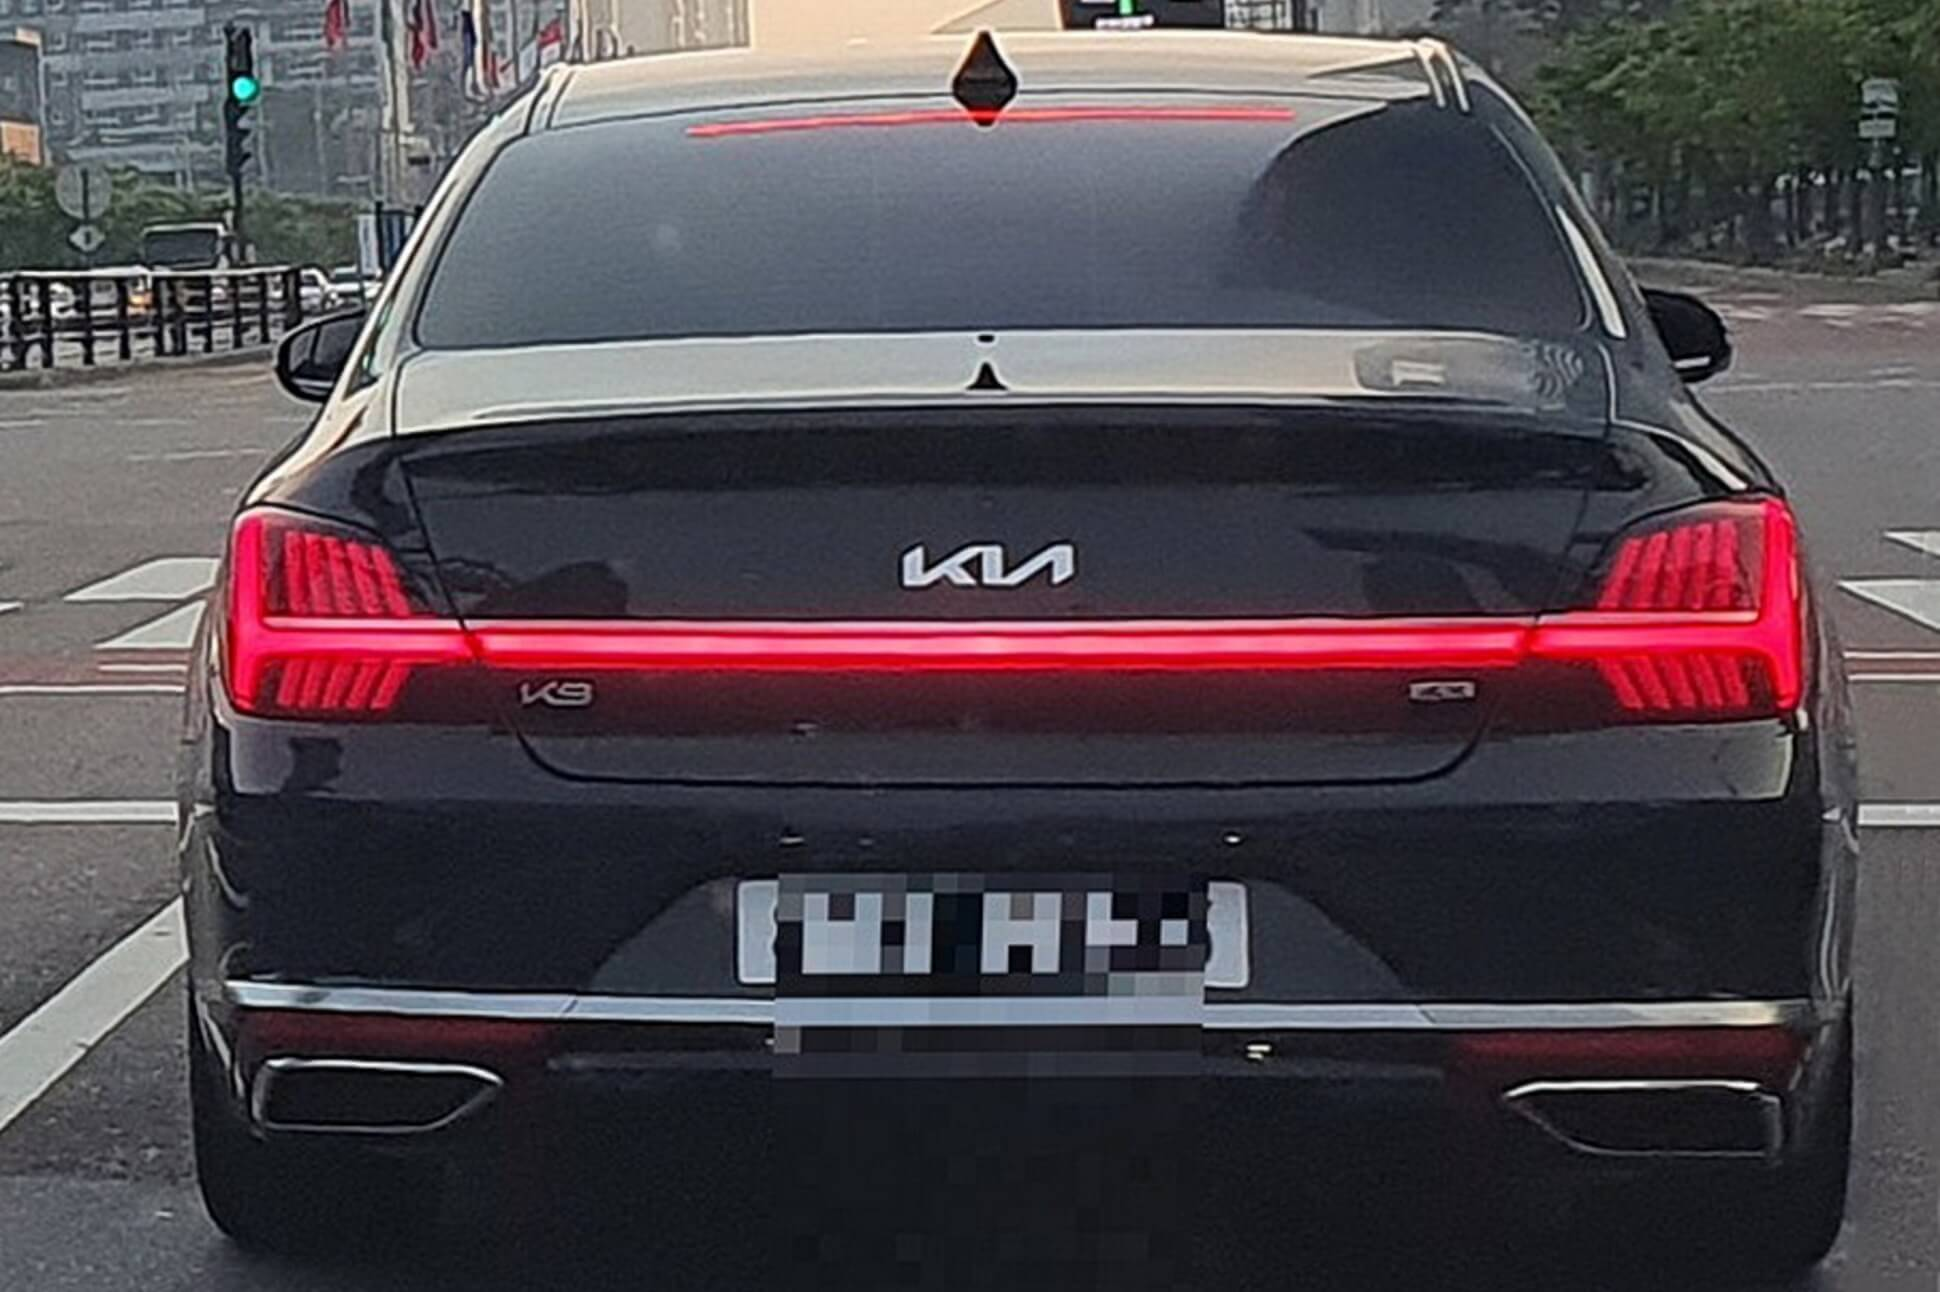 Оновлений Kia K9